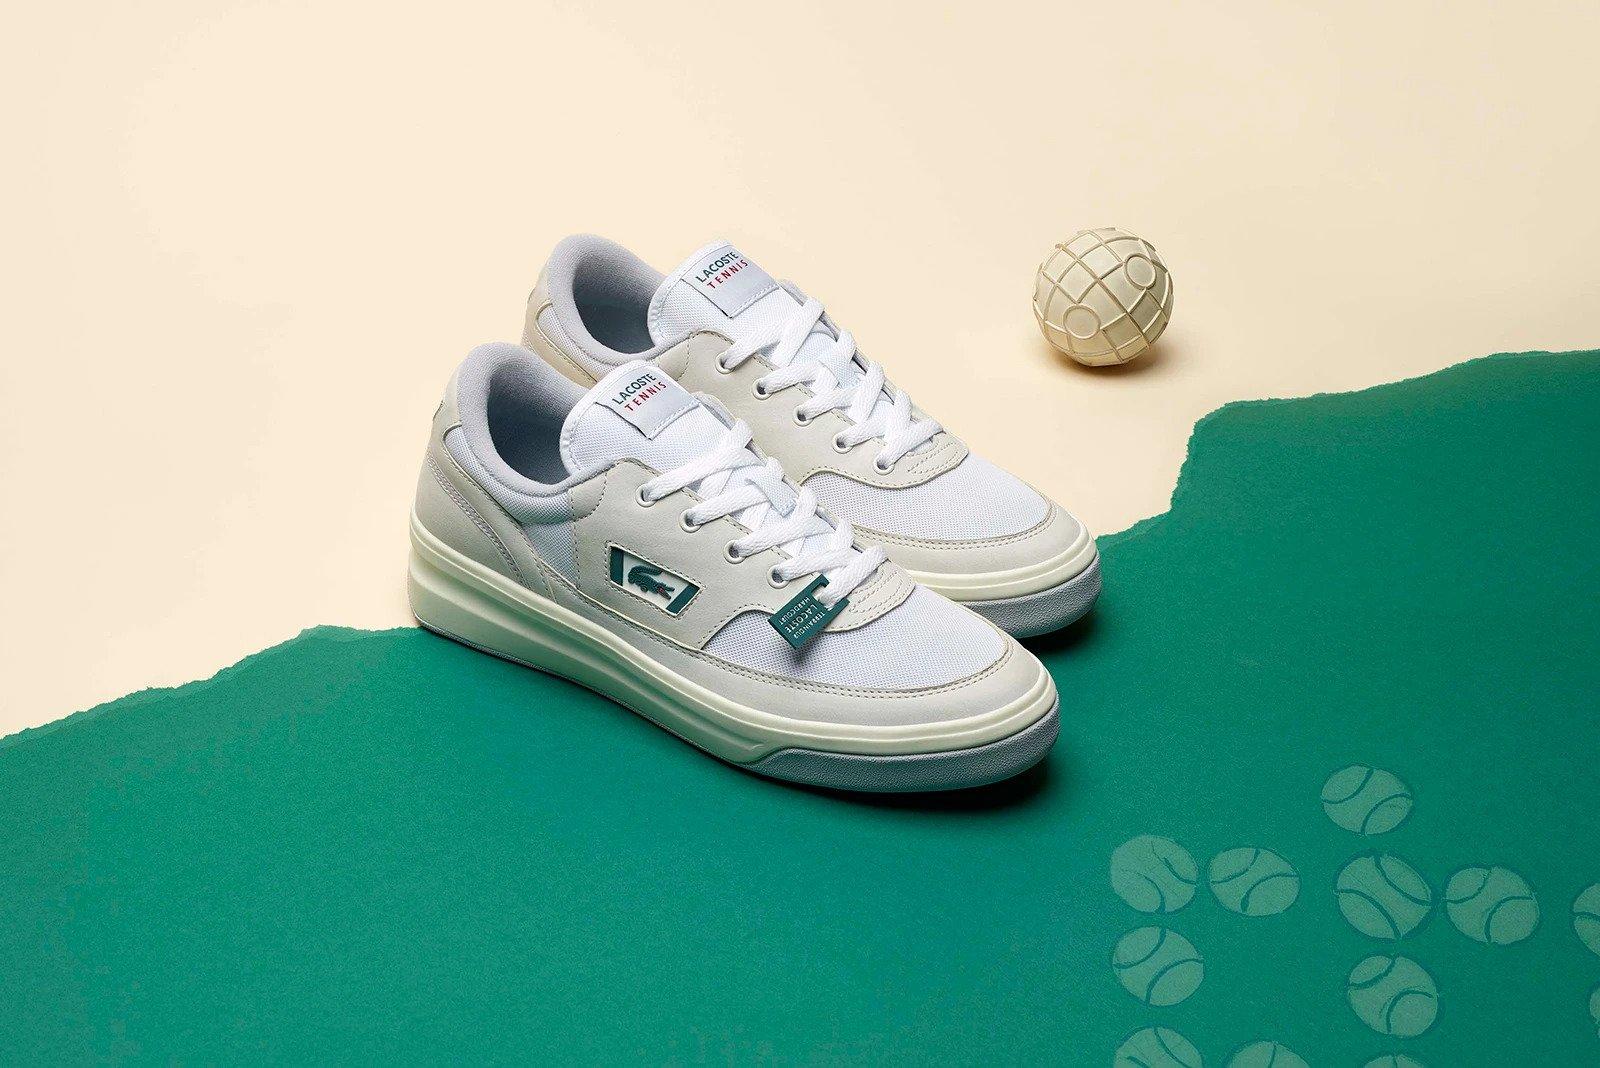 lacoste, rene, tennisschoenen, tennis-sneakers, 2